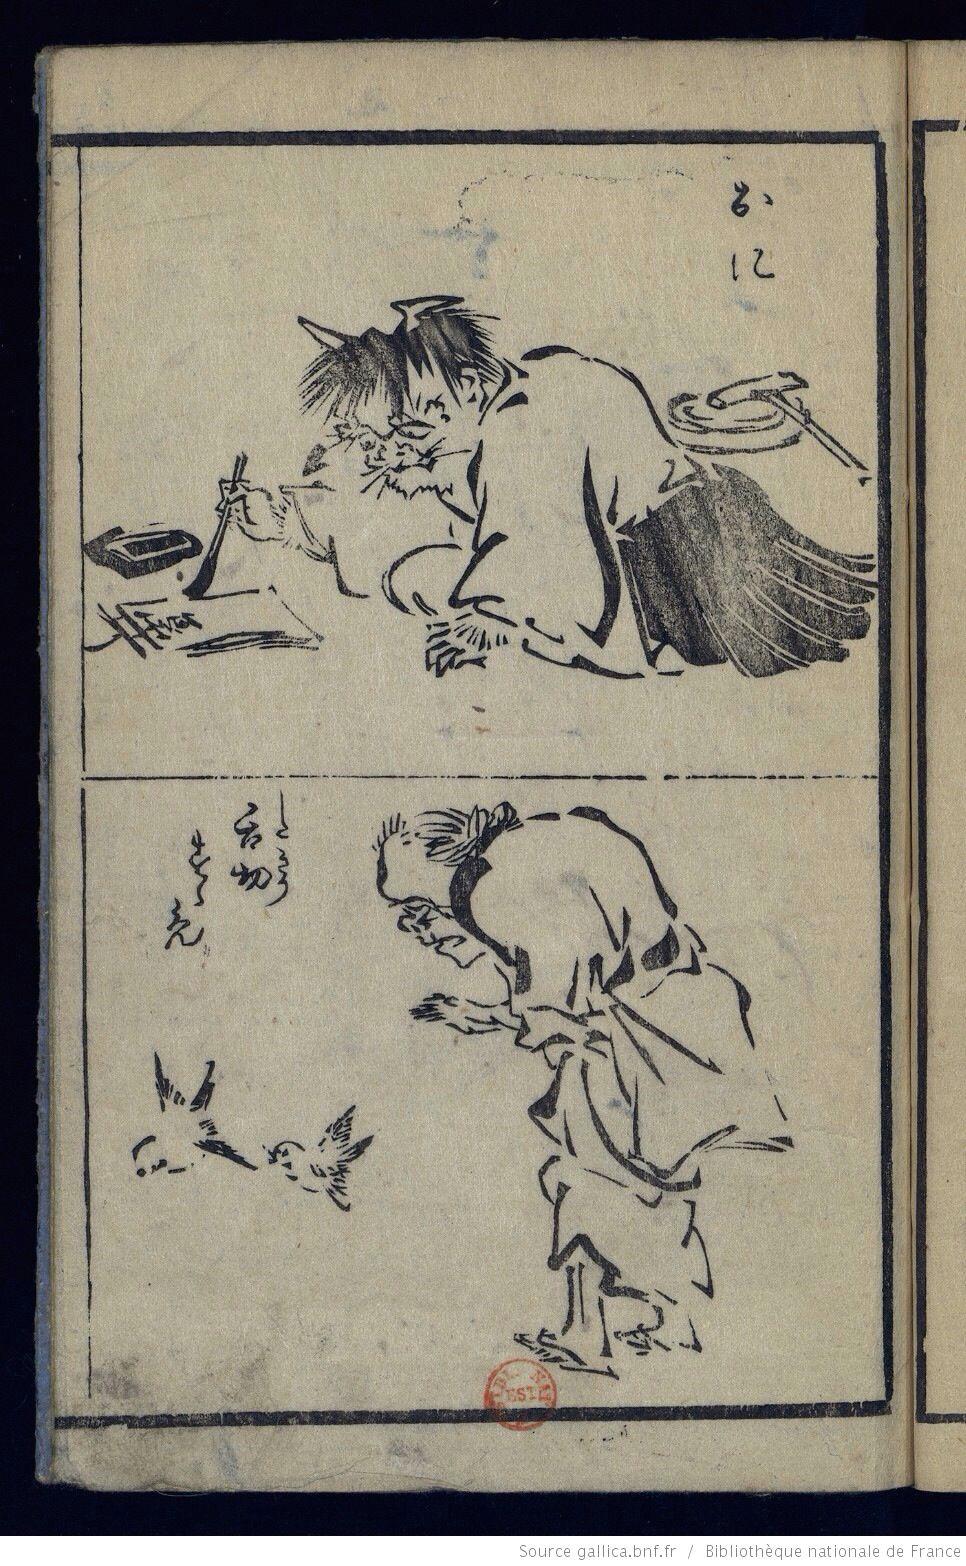 hokusai manga a re meiji art occidental art through the ages japanese prints